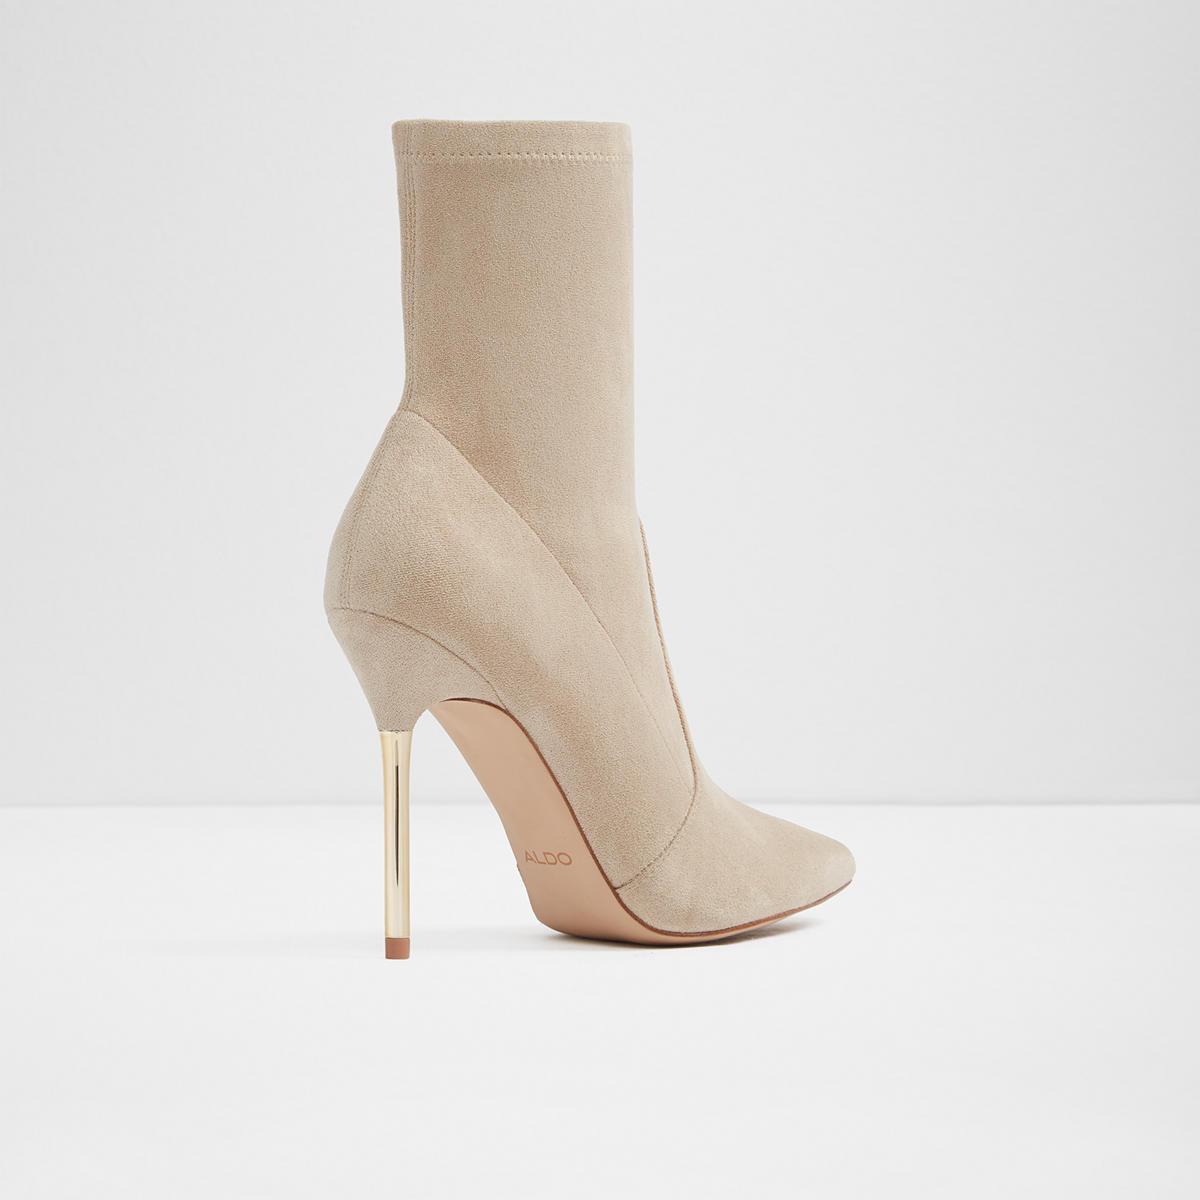 955586740ea Adwadia Taupe Women s Dress boots